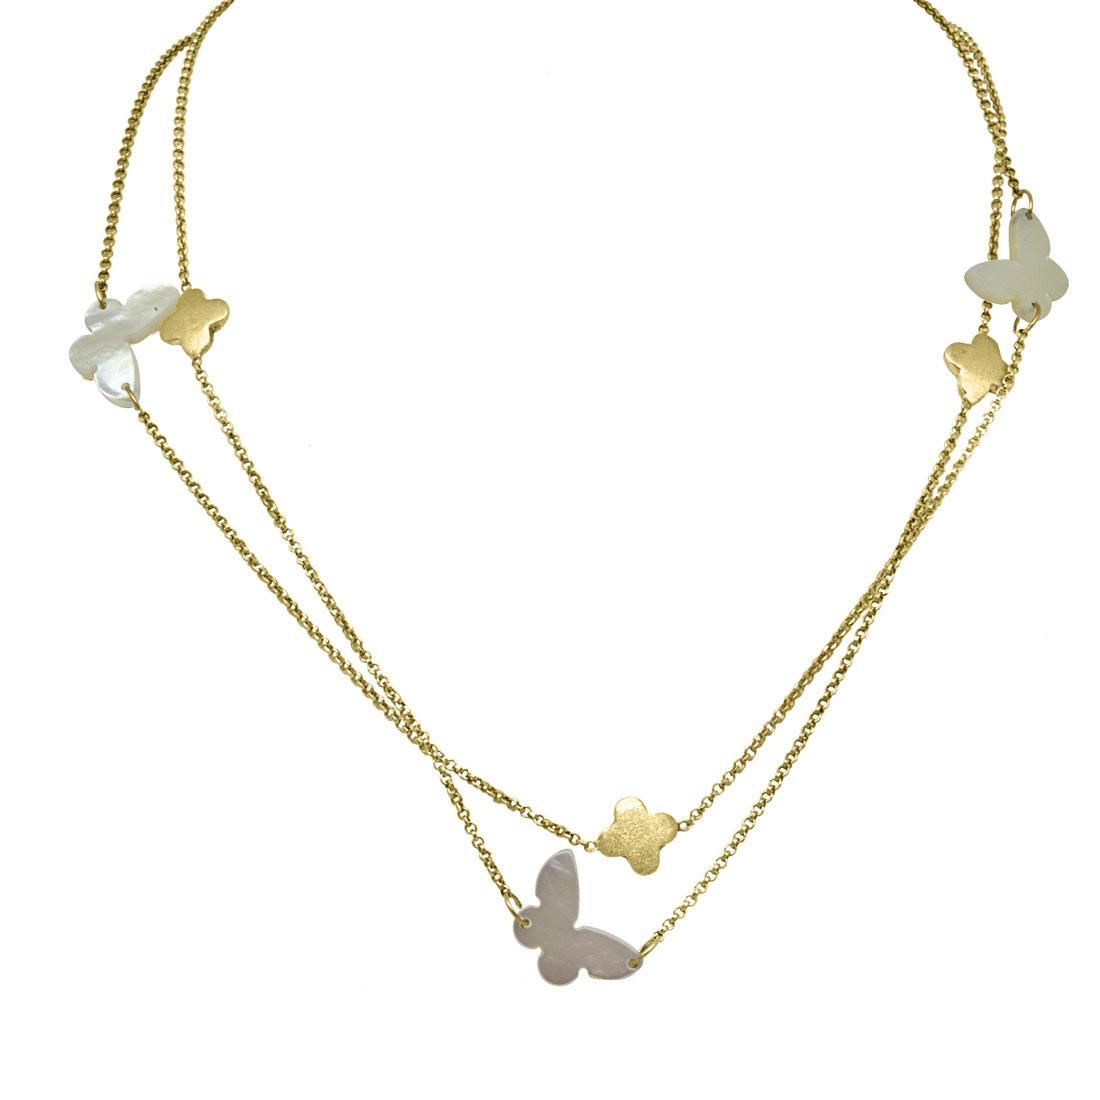 Collana in argento con farfalle - ZOCCAI